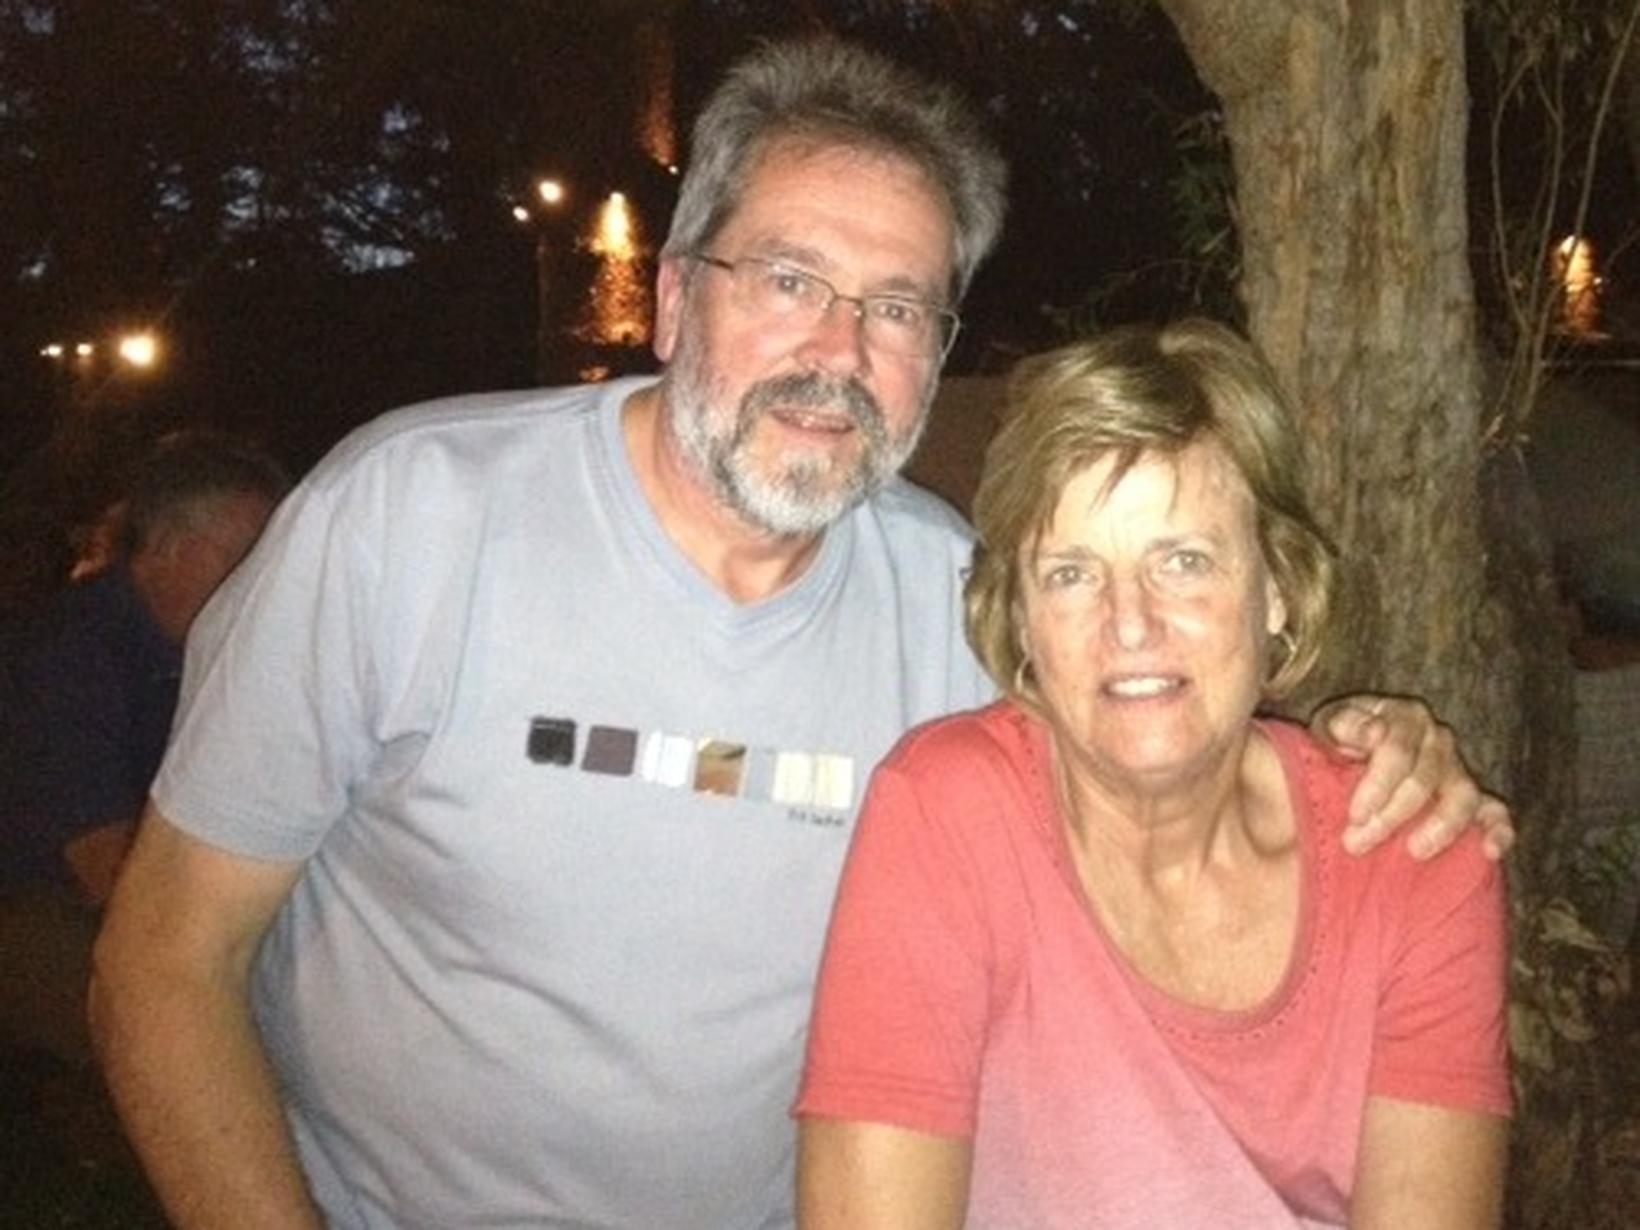 Jim & Kathryn from Albany, Western Australia, Australia